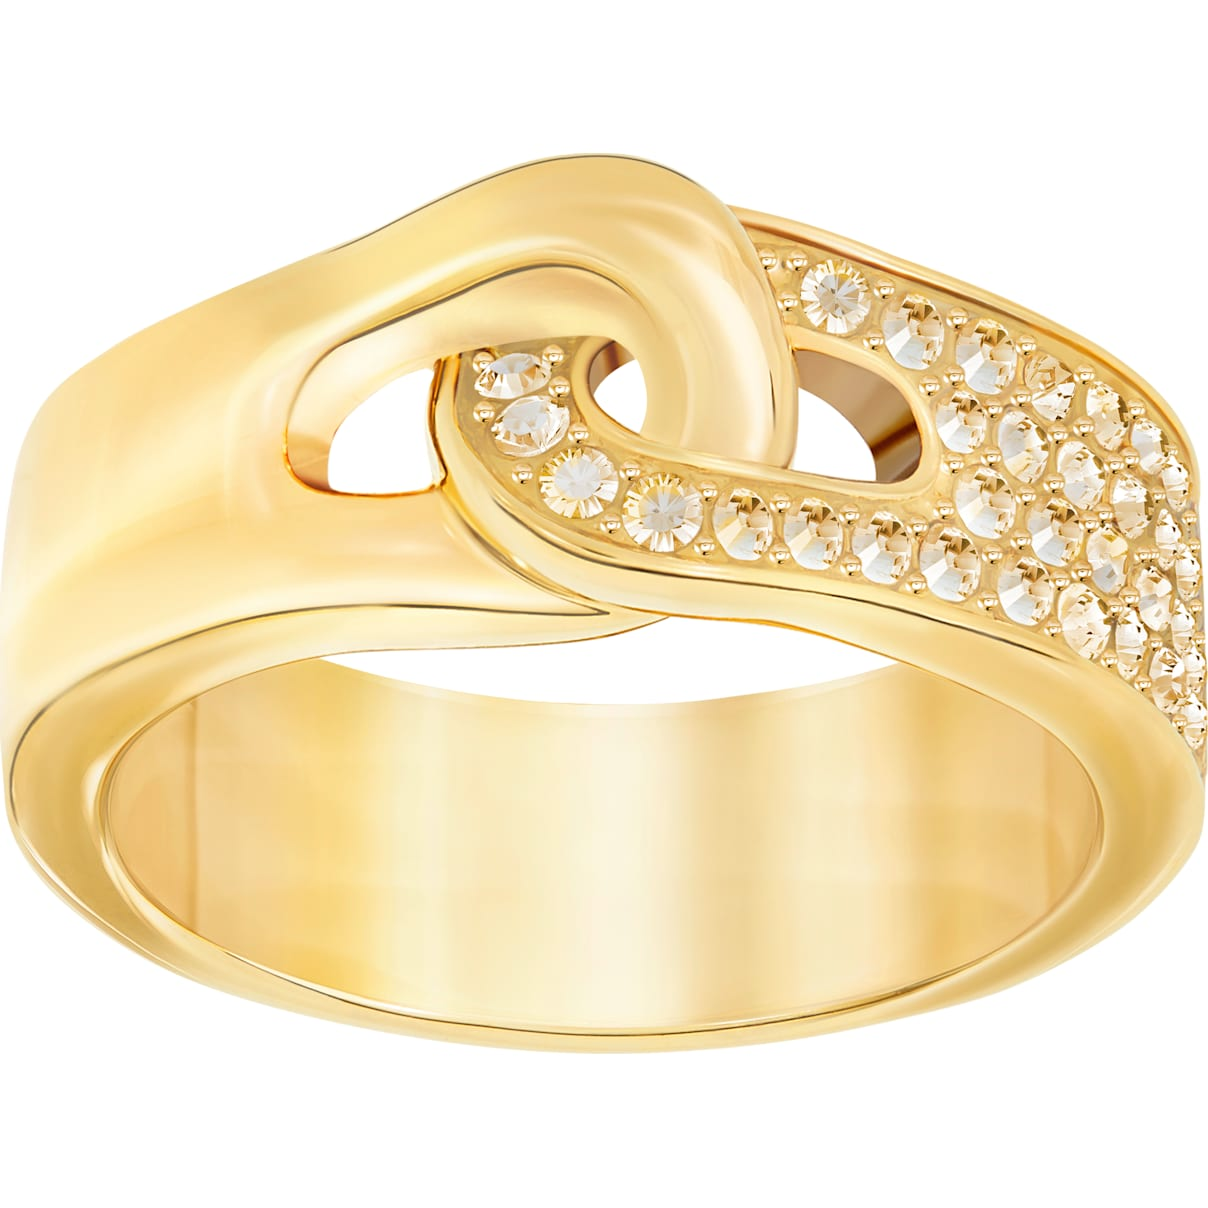 Swarovski Gallon Ring, Golden, Gold-tone plated